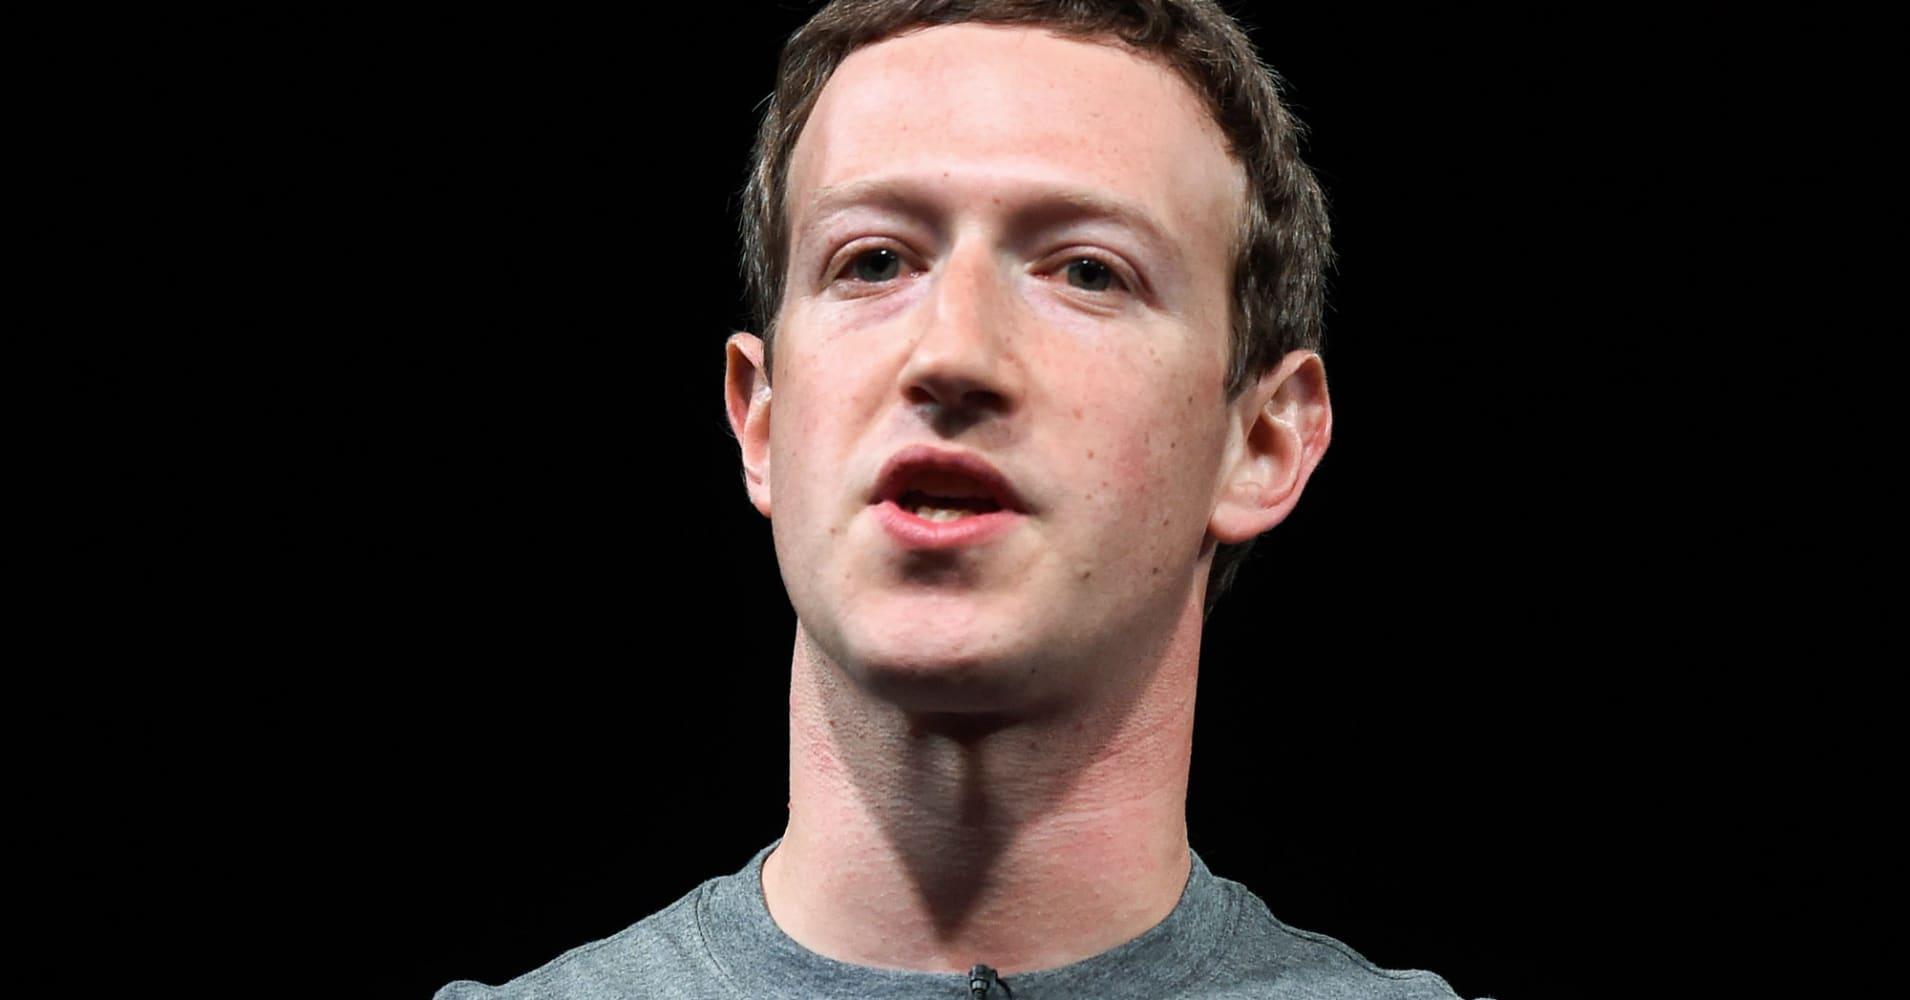 Senators send letter to Mark Zuckerberg asking for more details on the opposition PR firm Facebook hired image